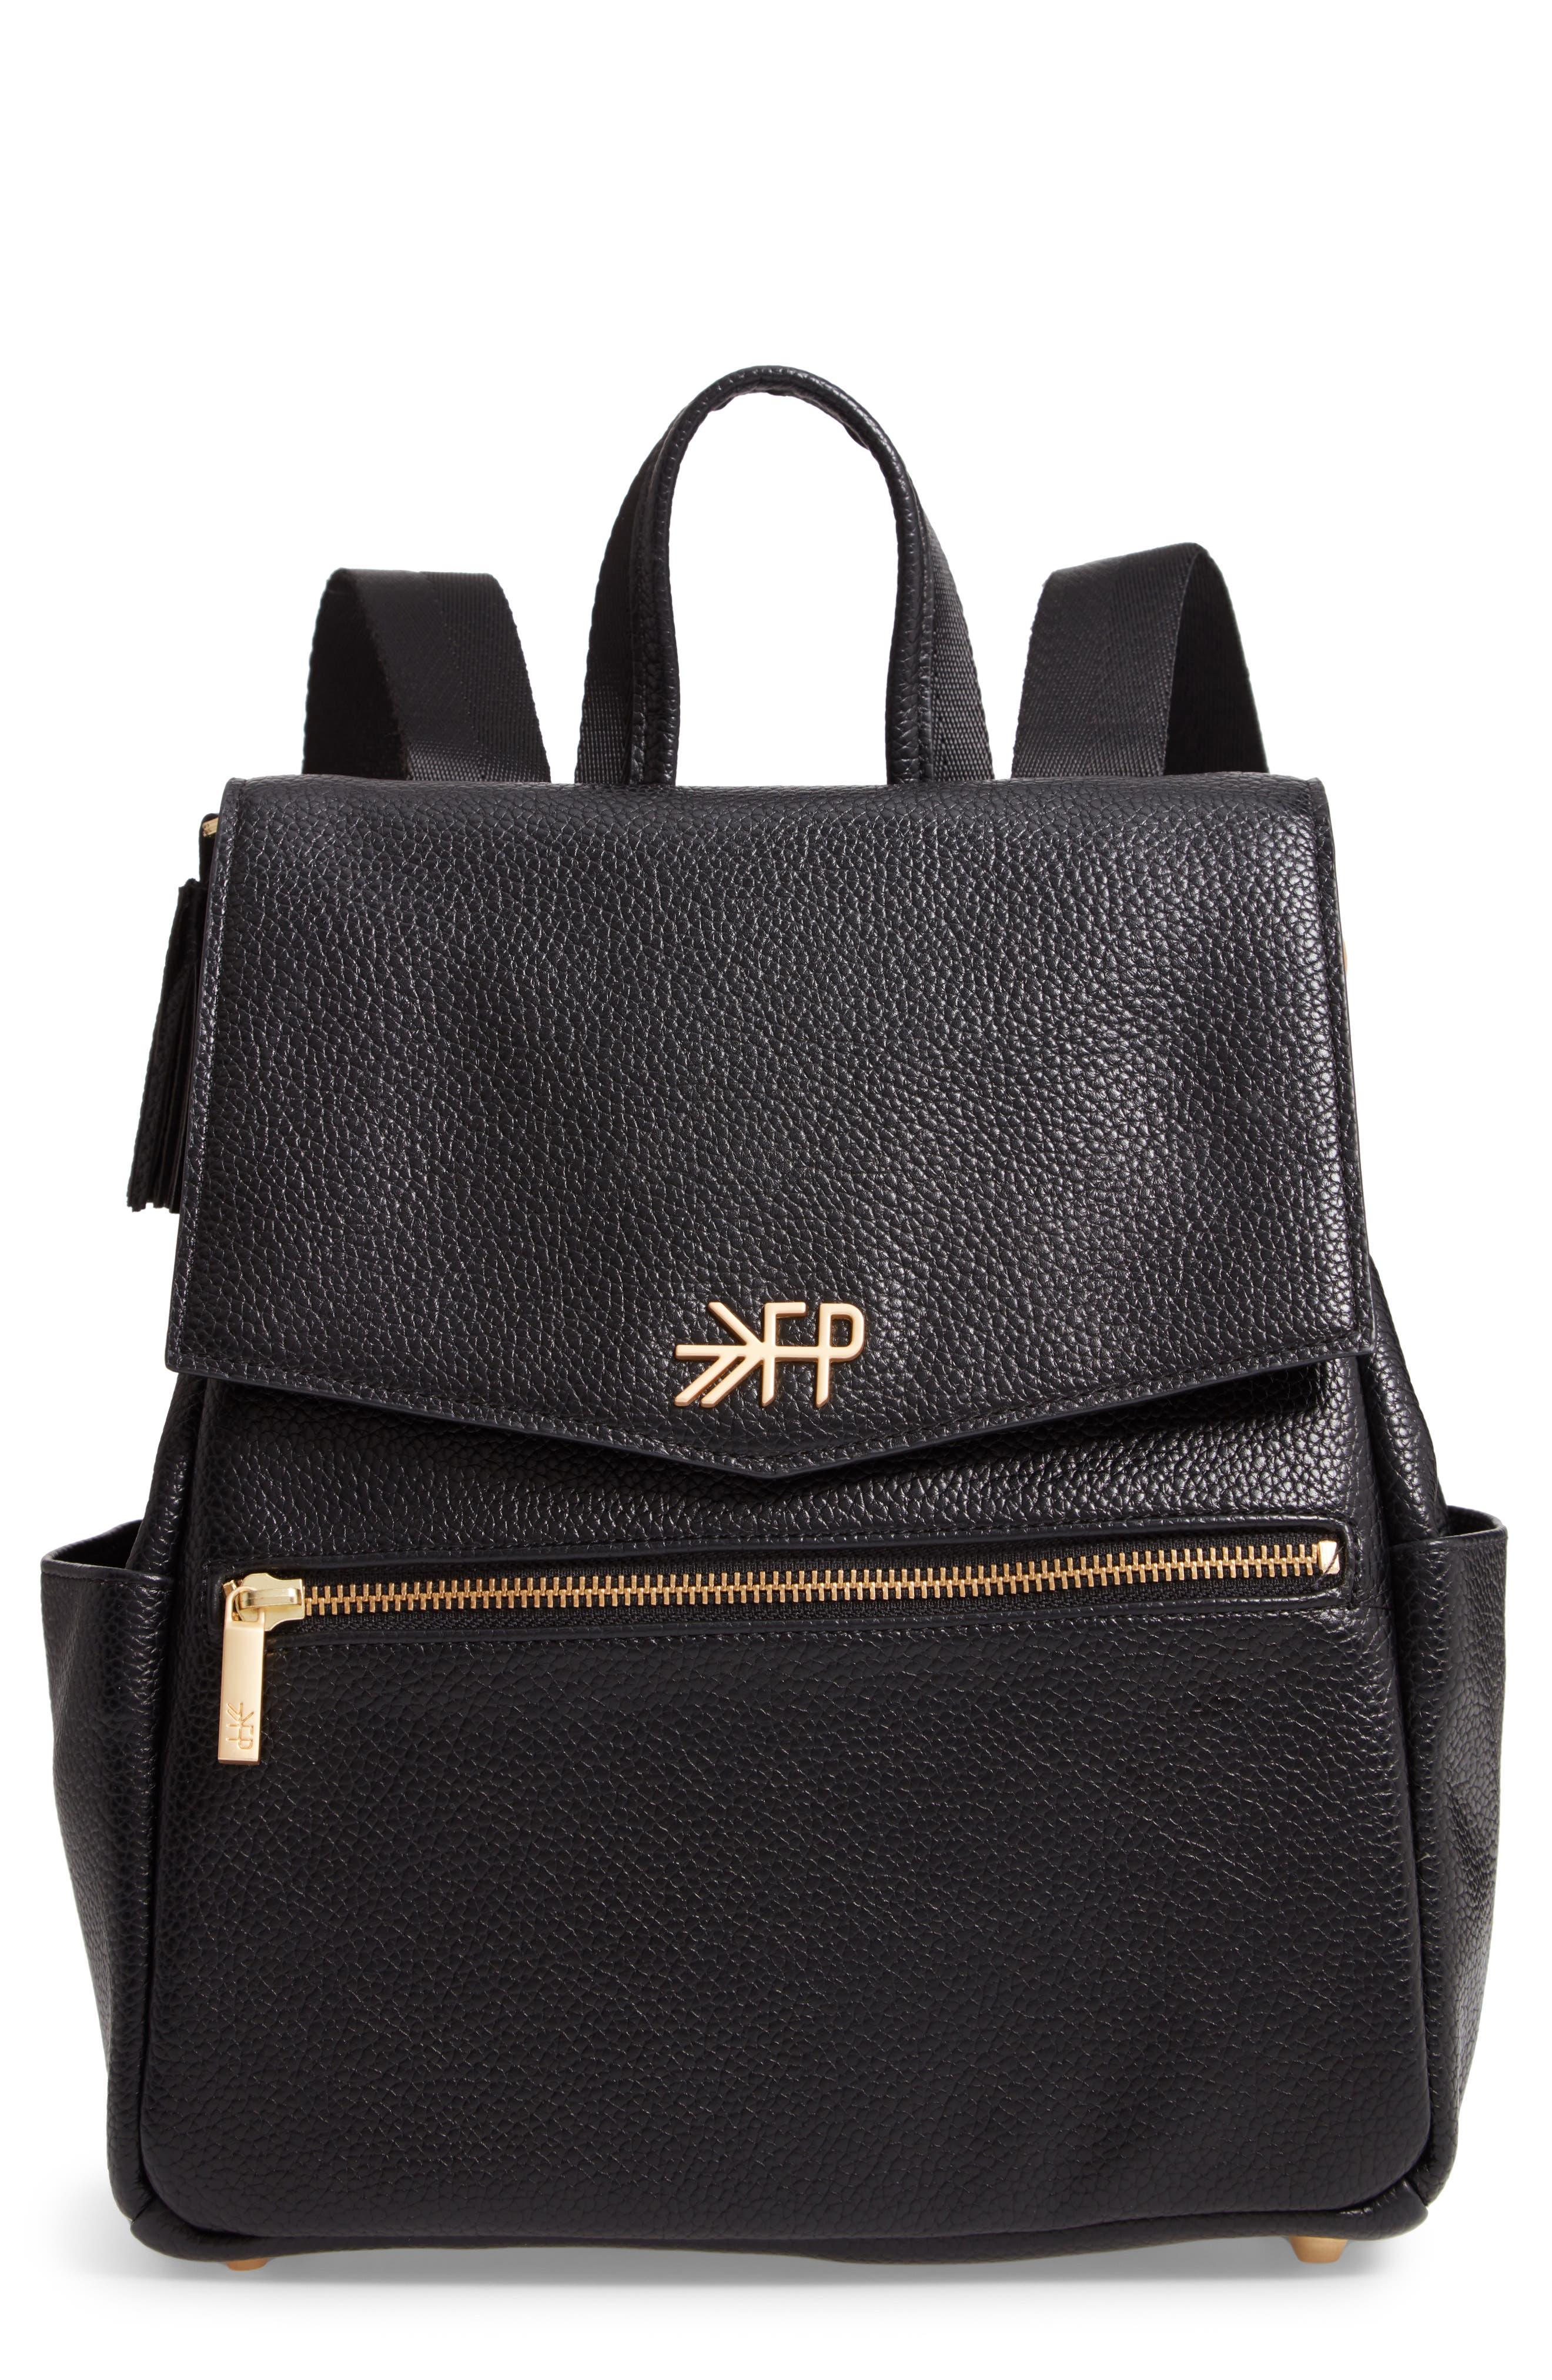 Mini Convertible Diaper Bag,                         Main,                         color, EBONY